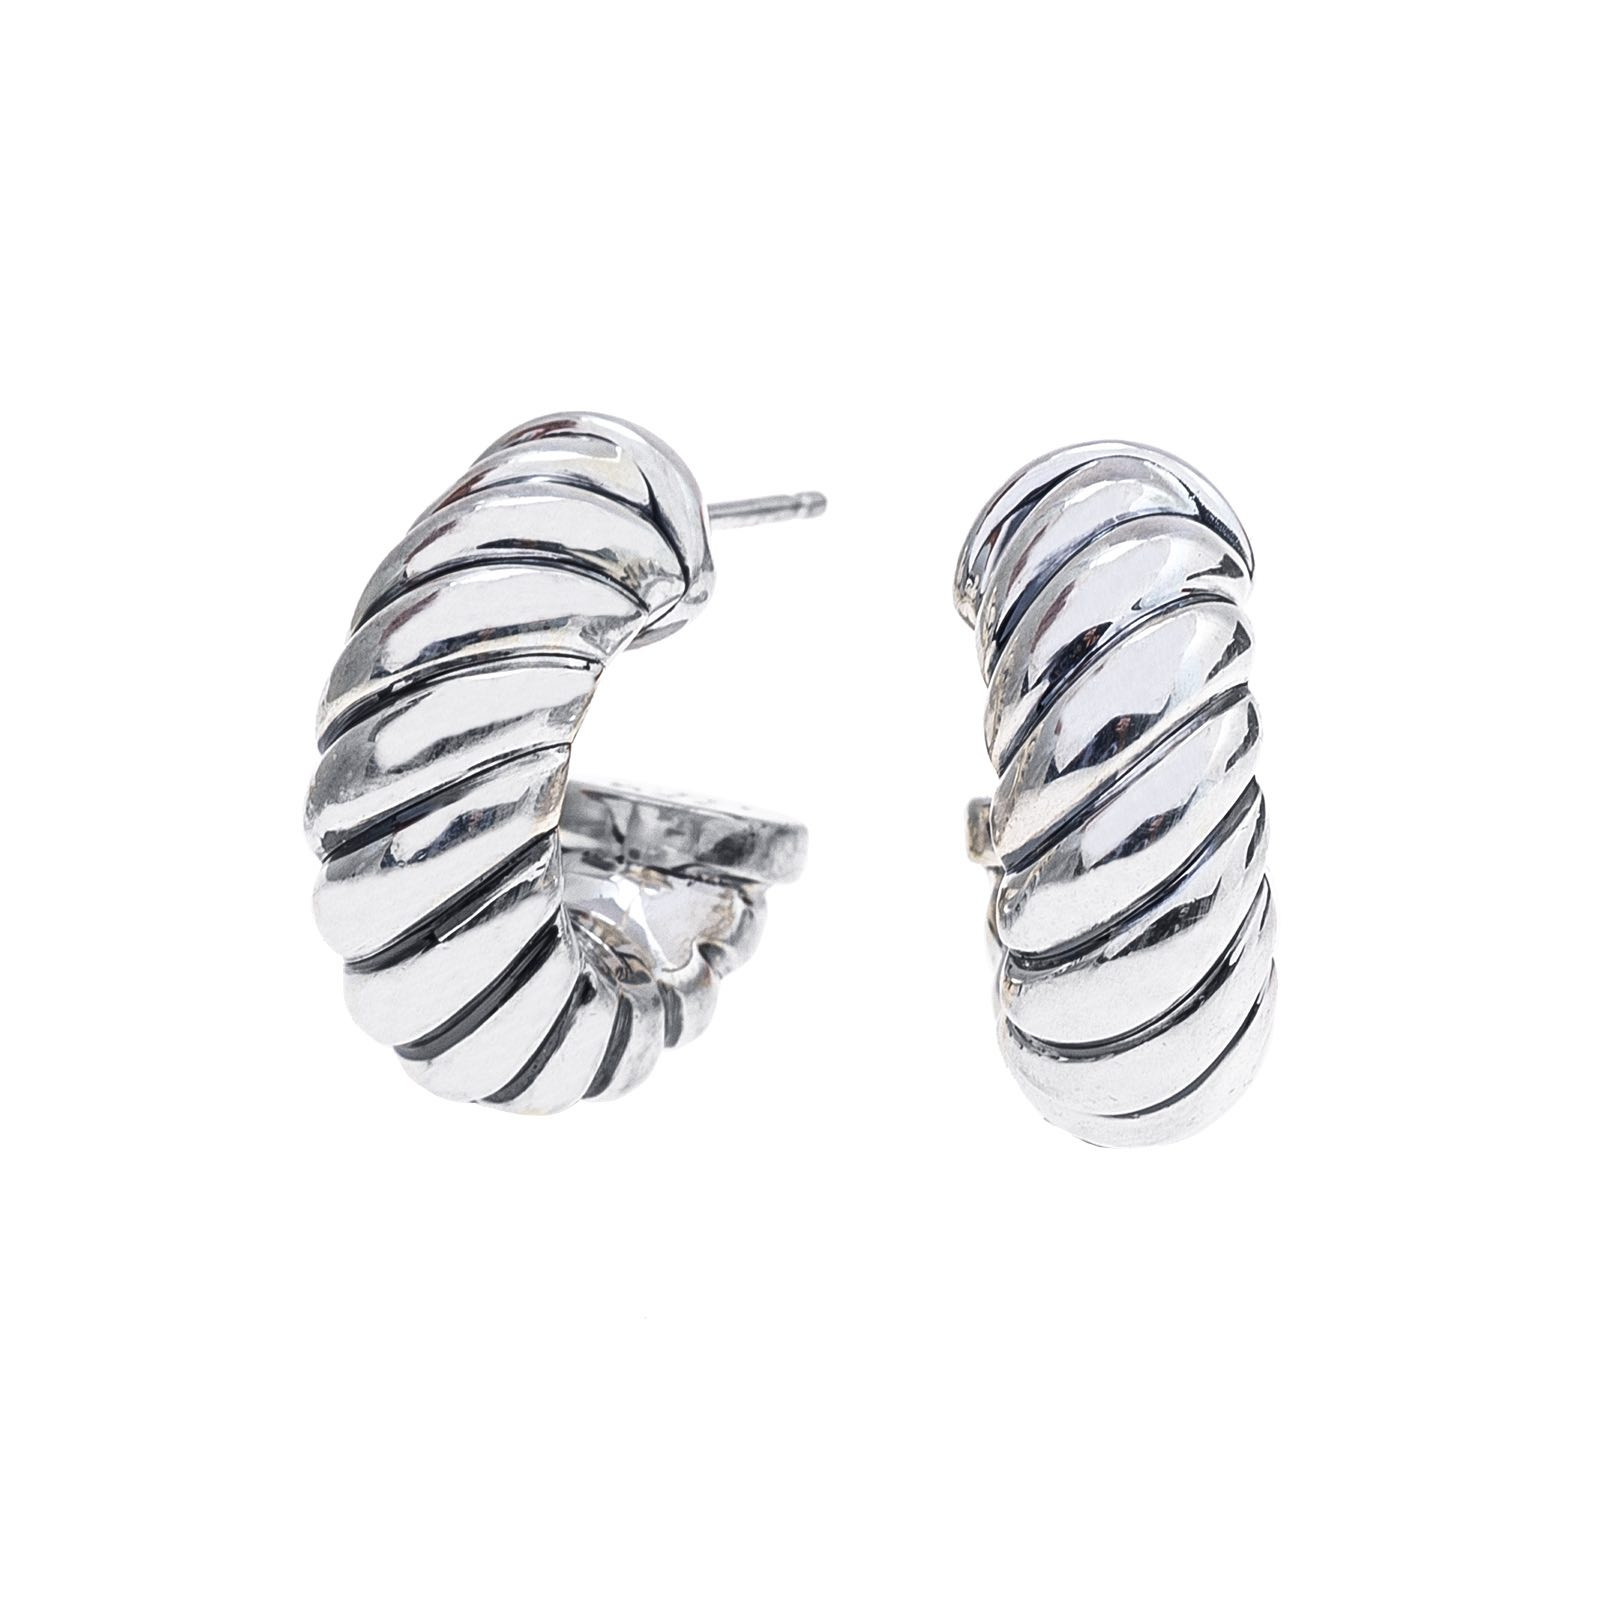 Vintage David Yurman Cable Classics Hoop Earrings